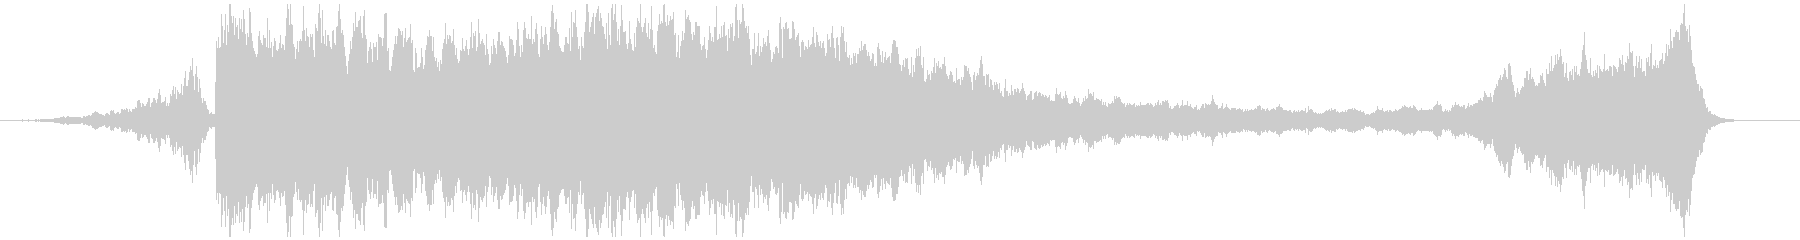 C/つらすぎる弦楽BGM・映像制作の未再生の波形